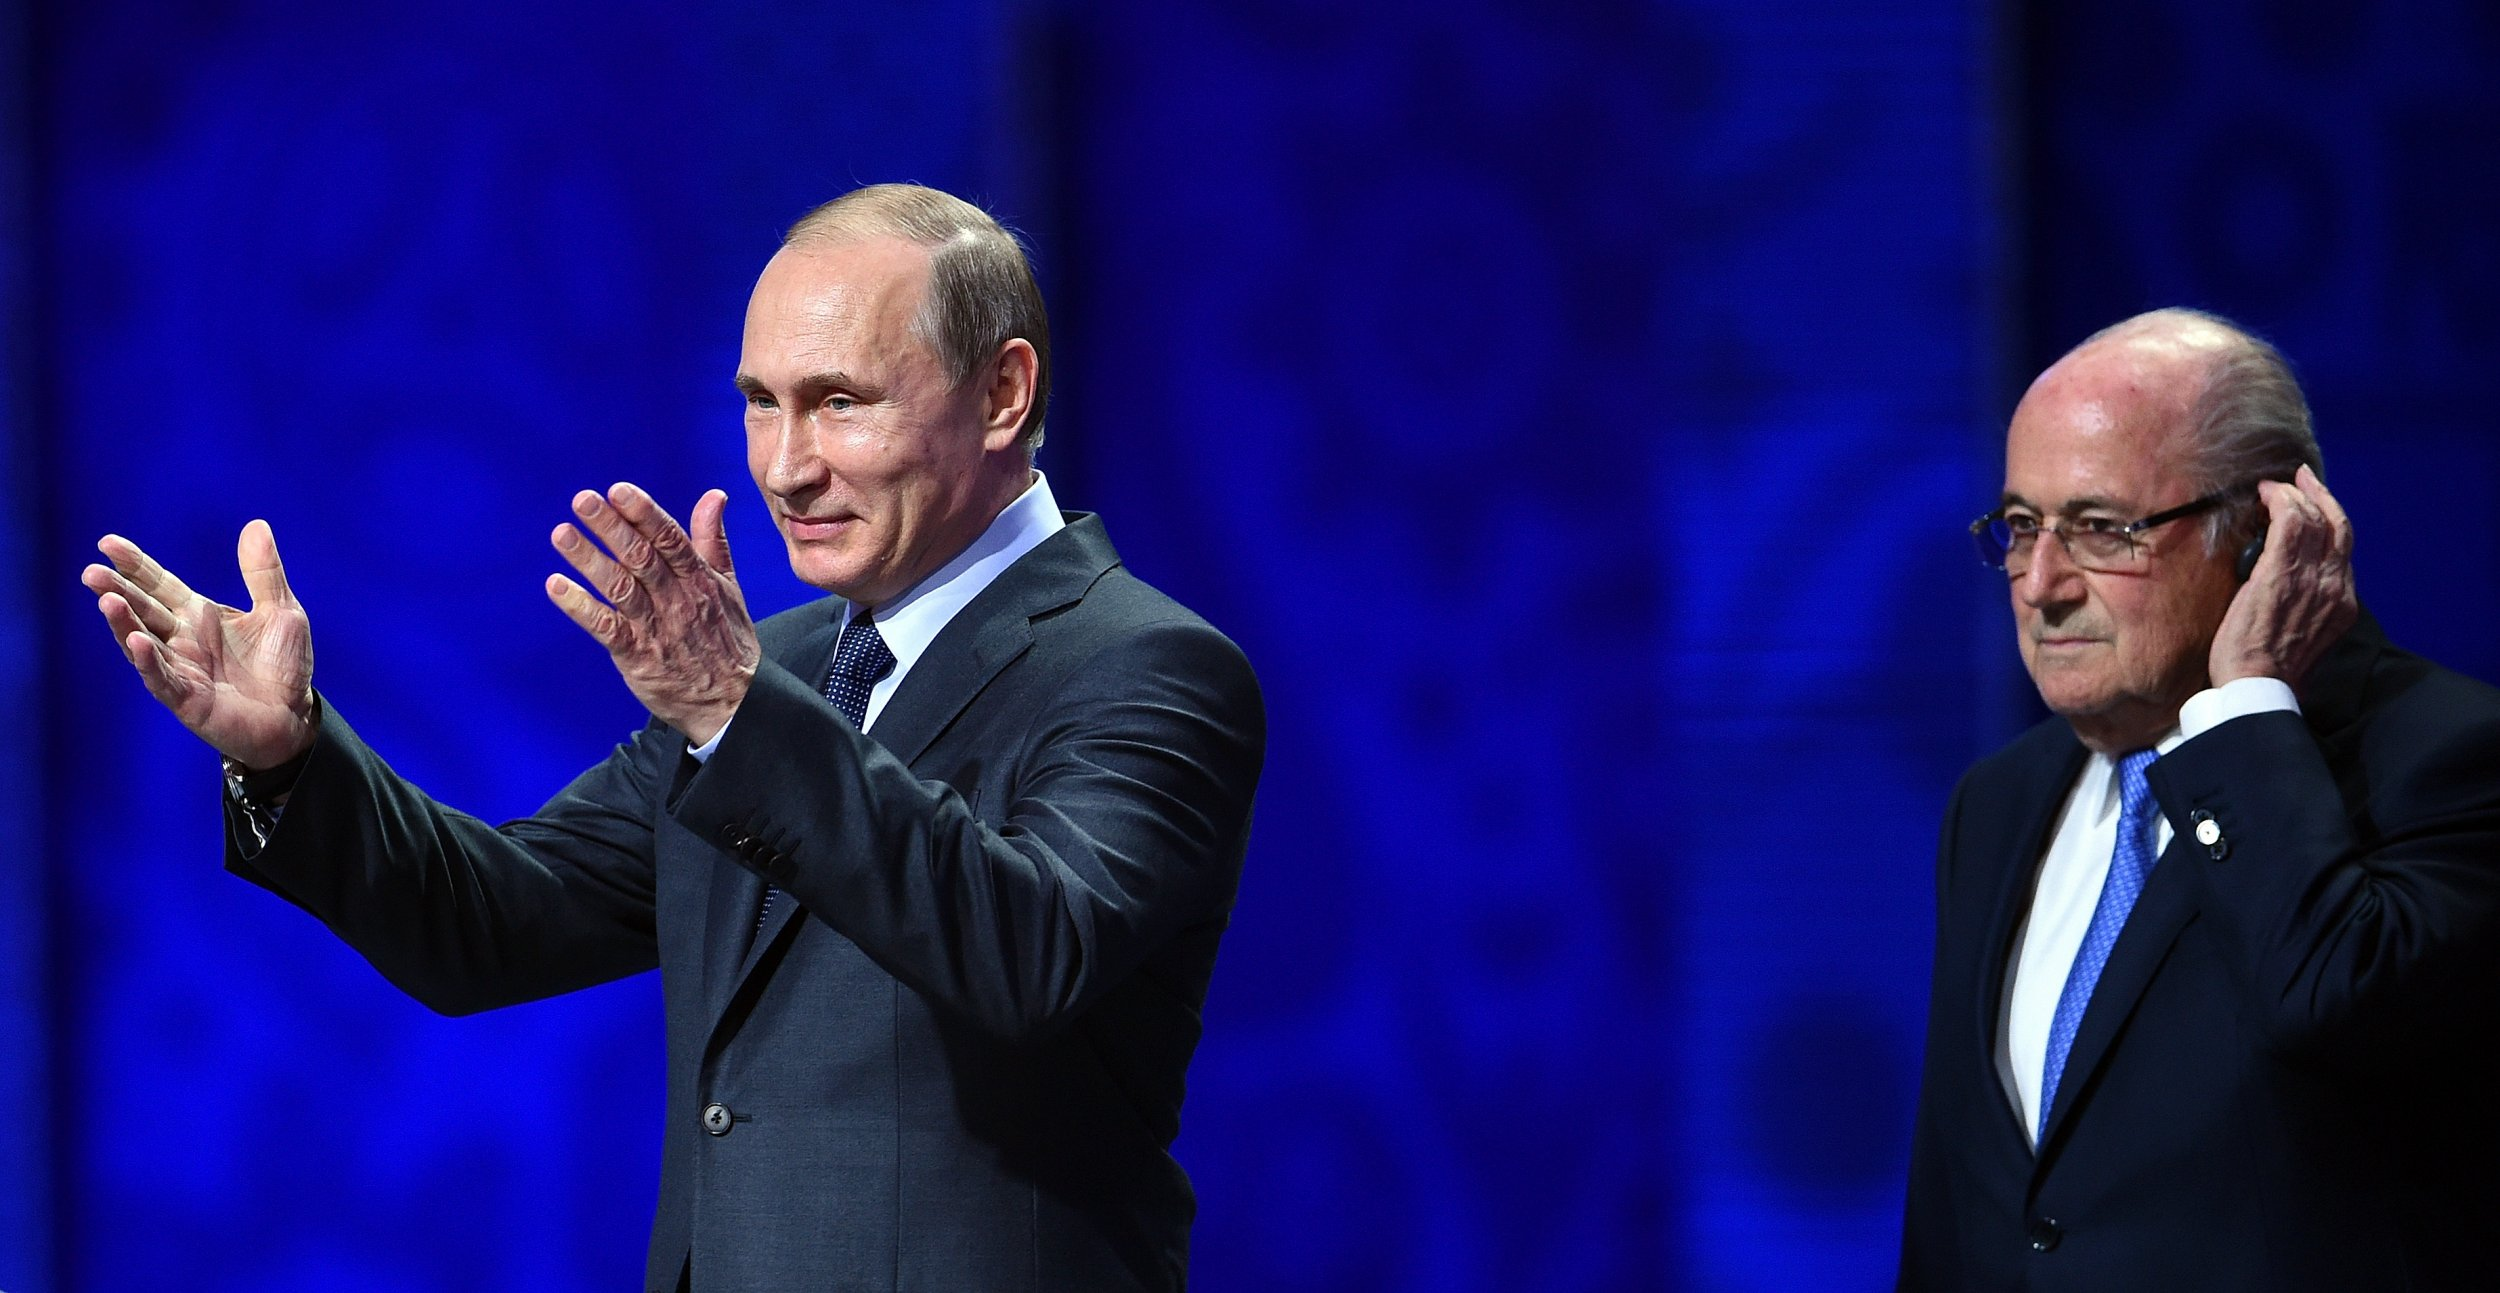 Vladimir Putin, President of Russia, with former FIFA president Sepp Blatter, right, at The Konstantin Palace, Saint Petersburg, July 25 2015.